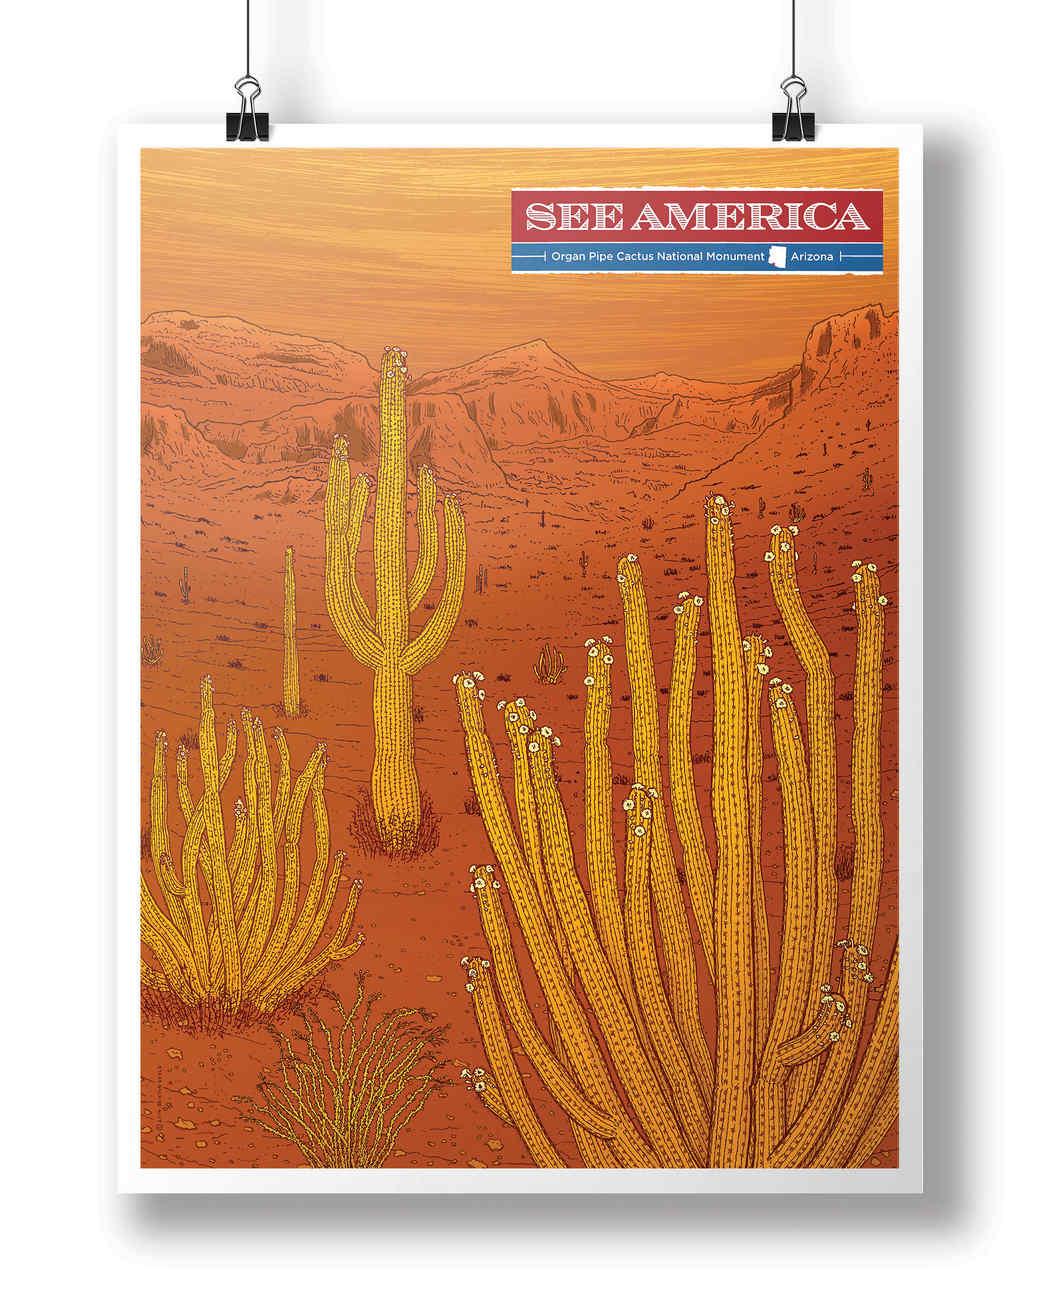 see-america_organ-pipe-cactus_c-adam-s.-doyle.jpg